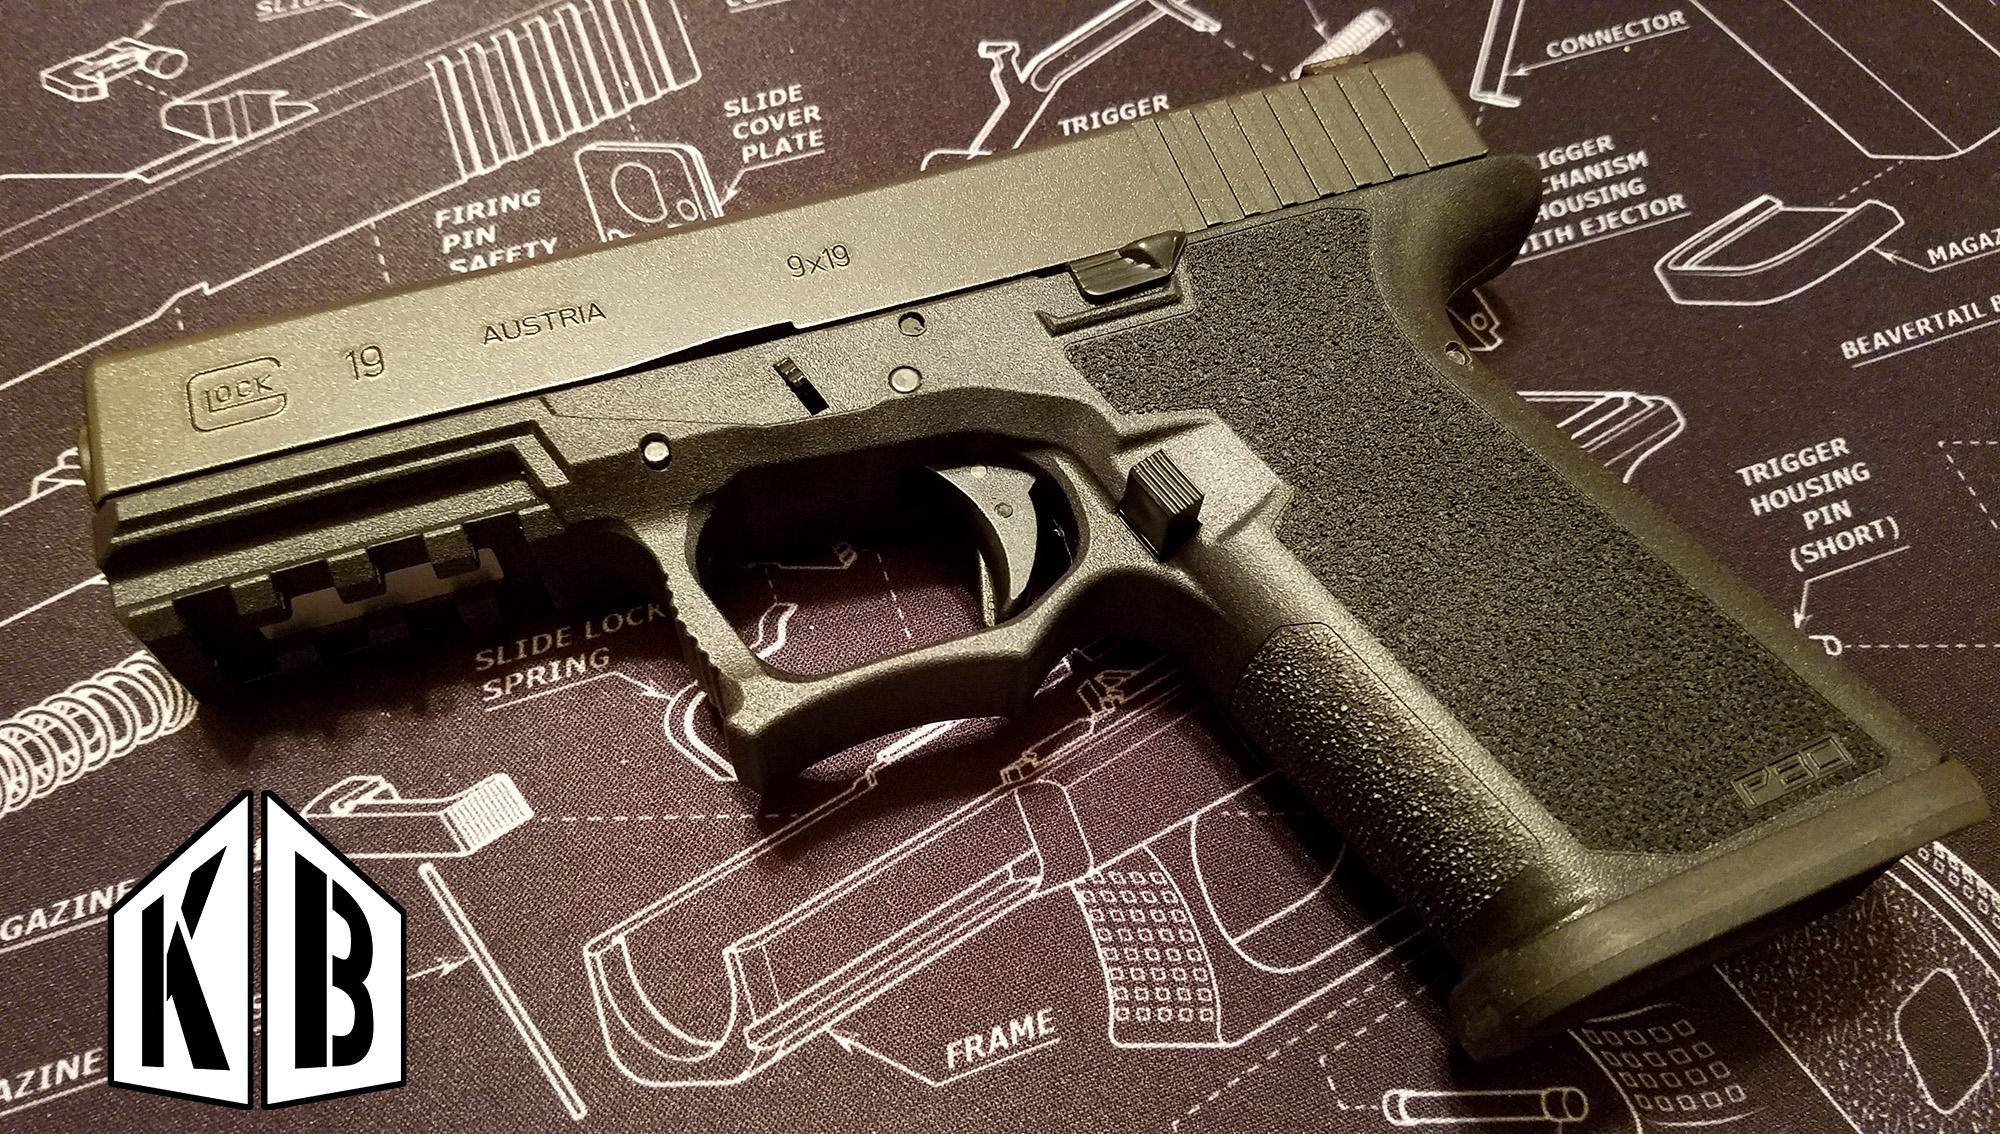 Polymer80 Pf940c Glock 19 The Kommando Blog